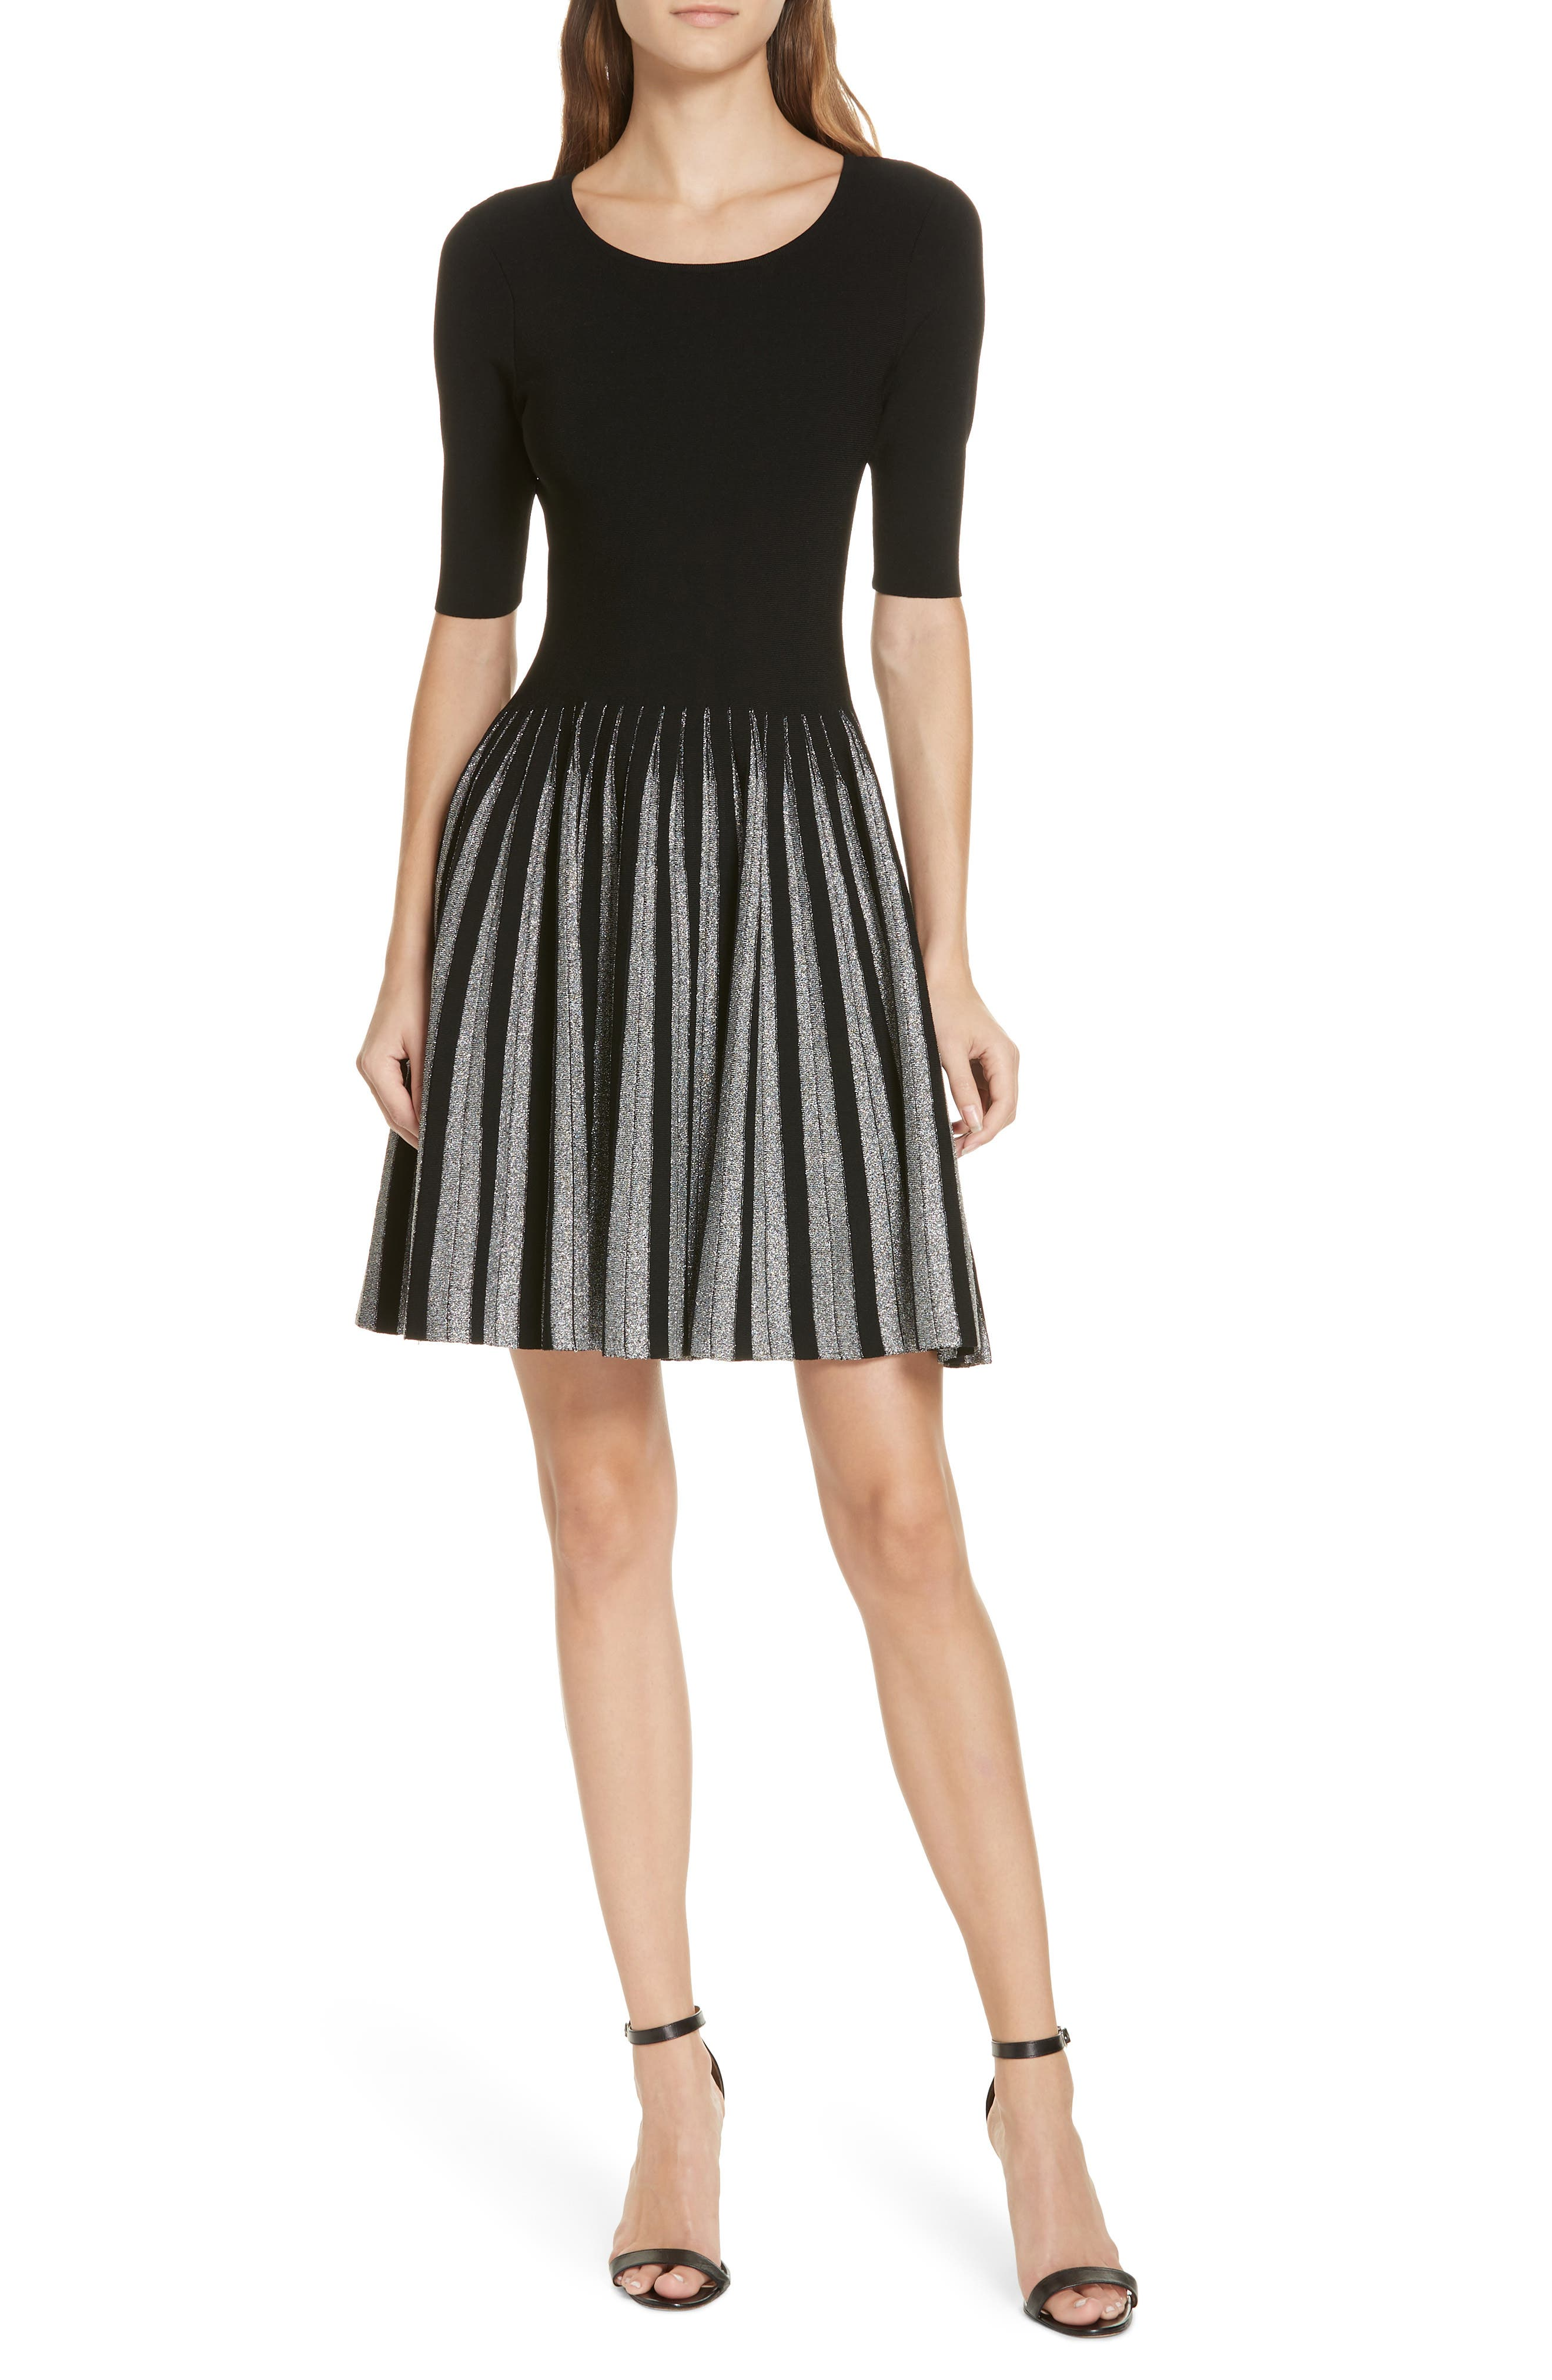 Milly Metallic Pleat Fit & Flare Dress, Black